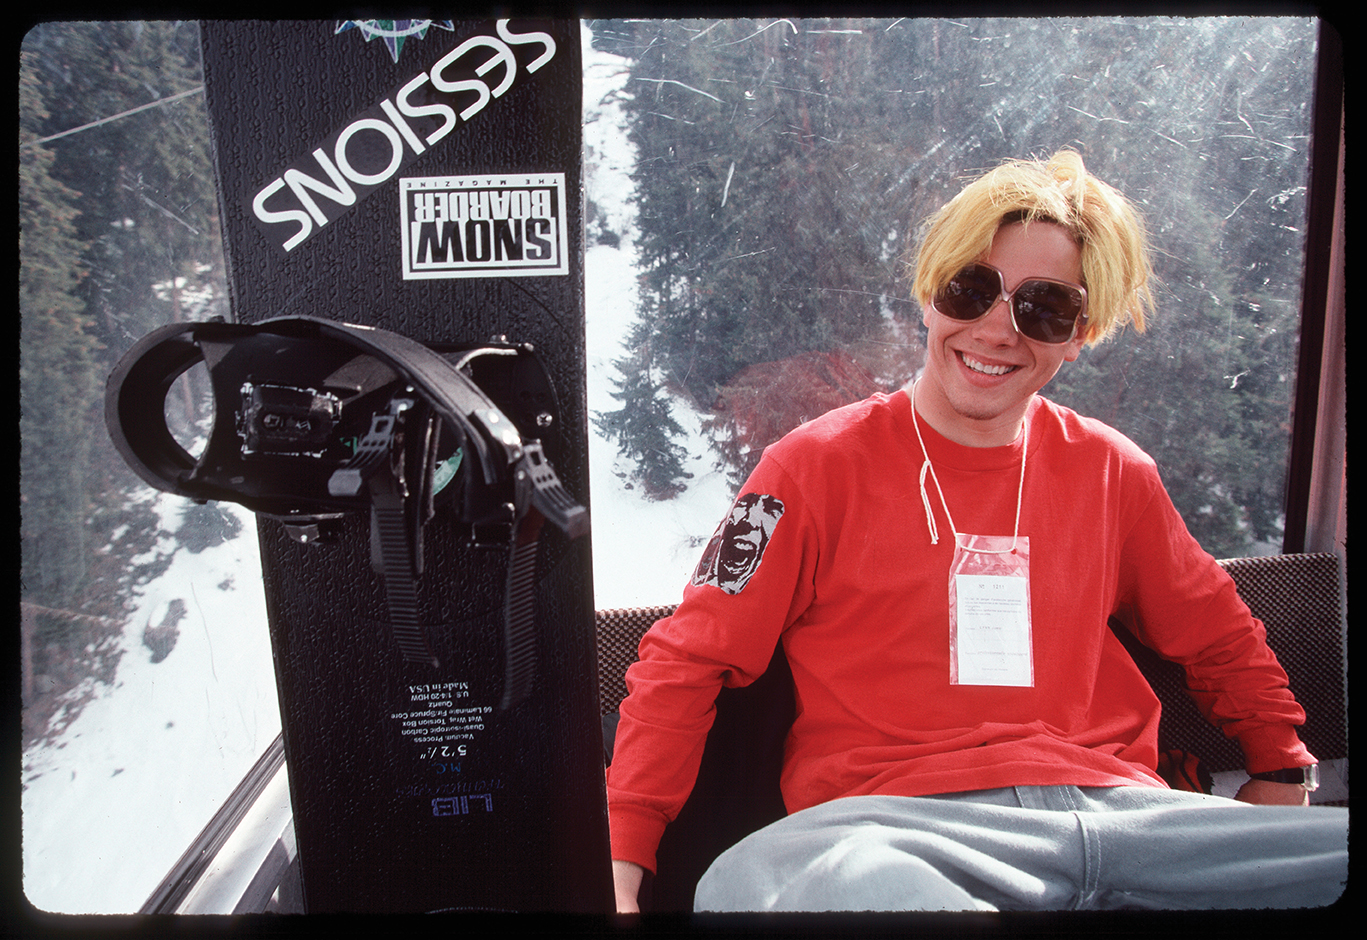 Jaime Lynn shot by Bud Fawcett, 1994 (From Snow Beach edited by Alex Dymond, published by powerHouse Books.)